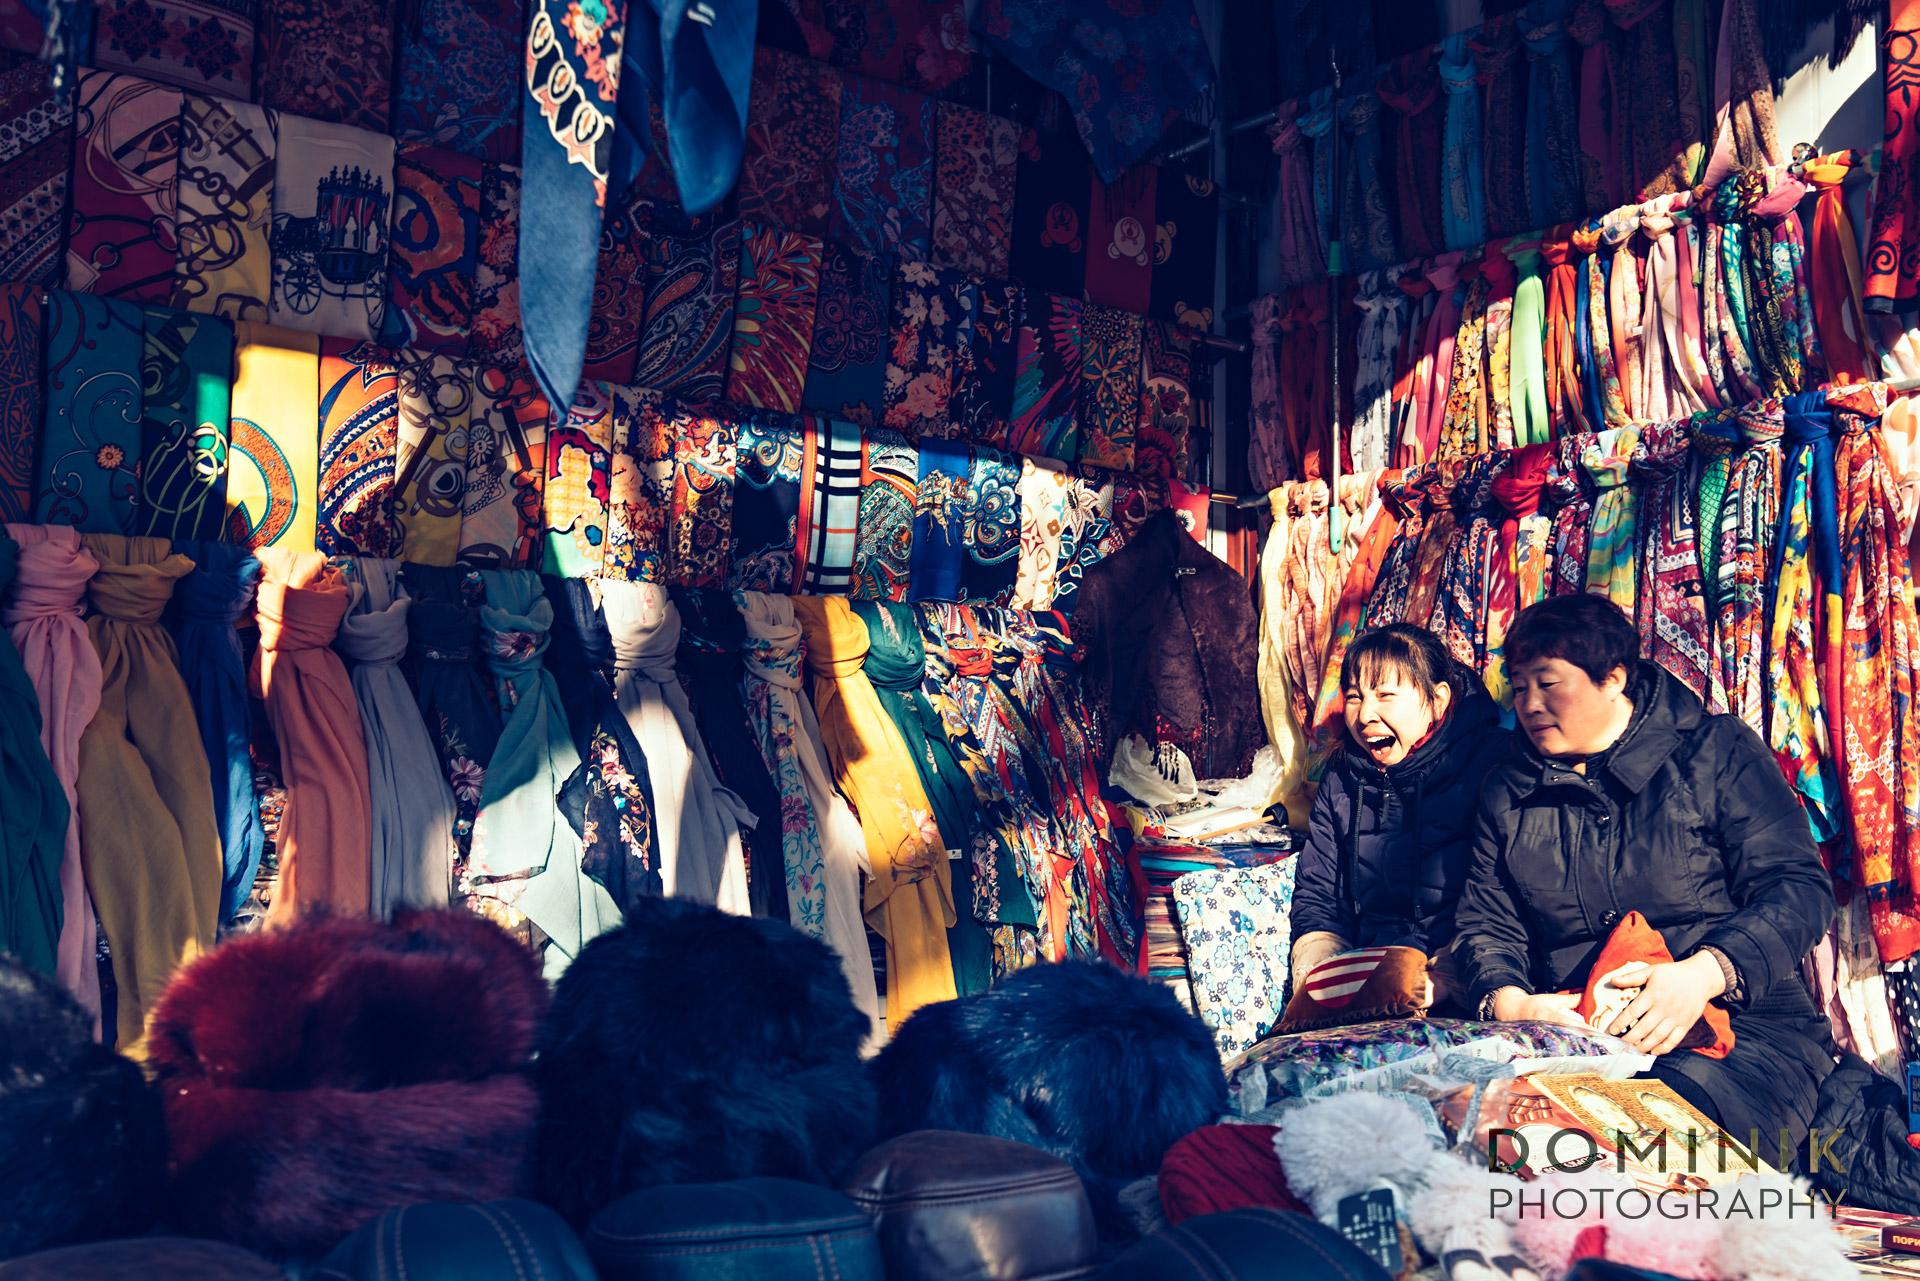 Dominik photographs in Dalian China